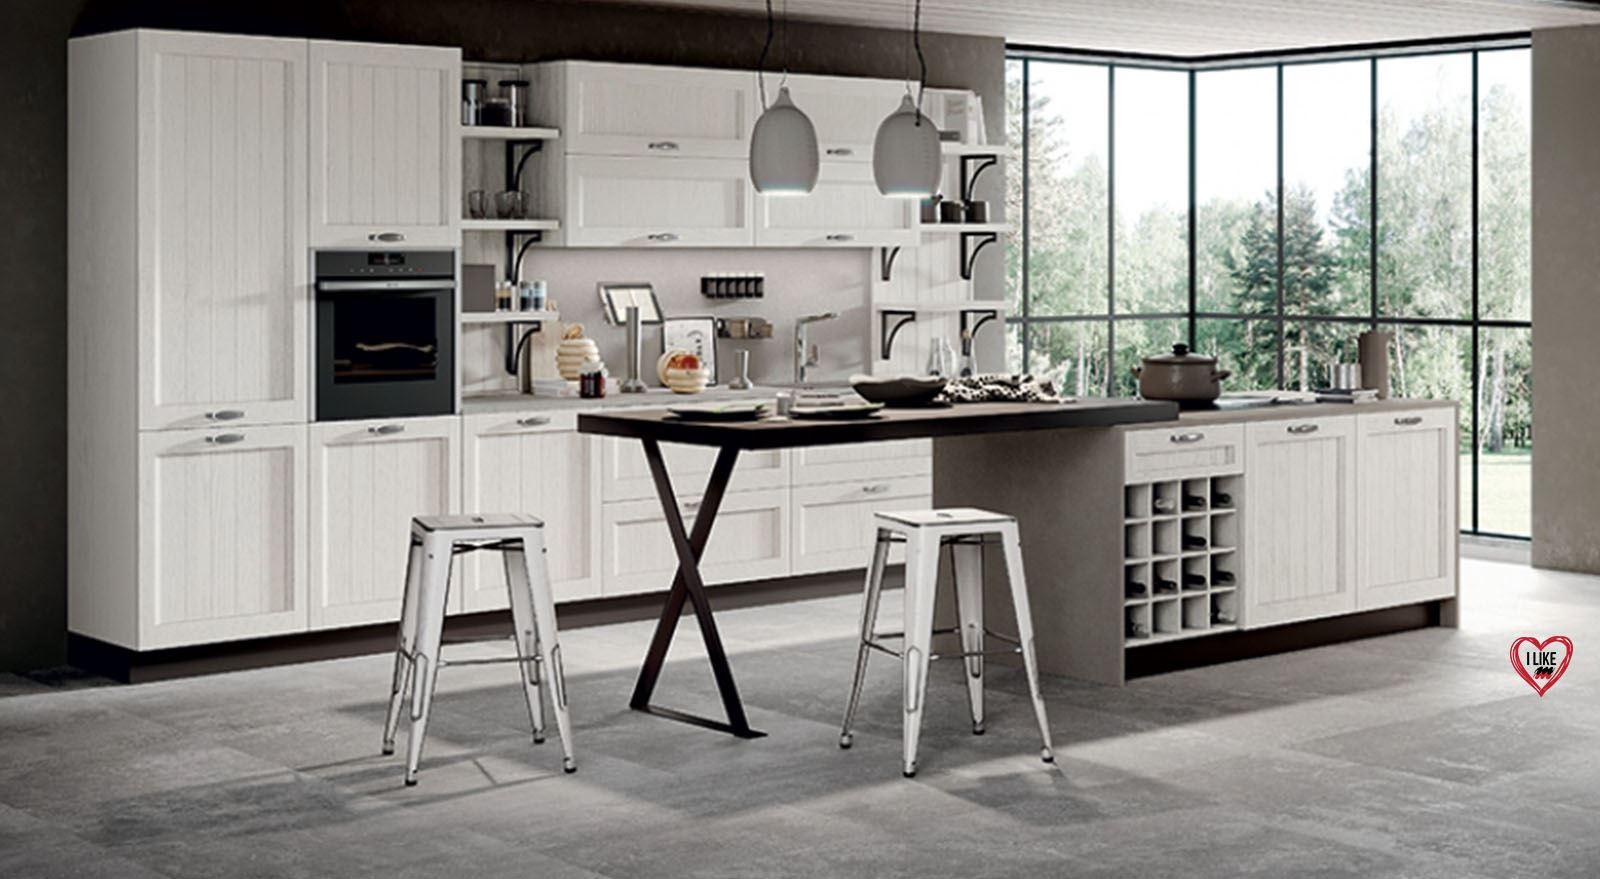 Awesome Migliori Cucine Italiane Images - Amazing House Design ...